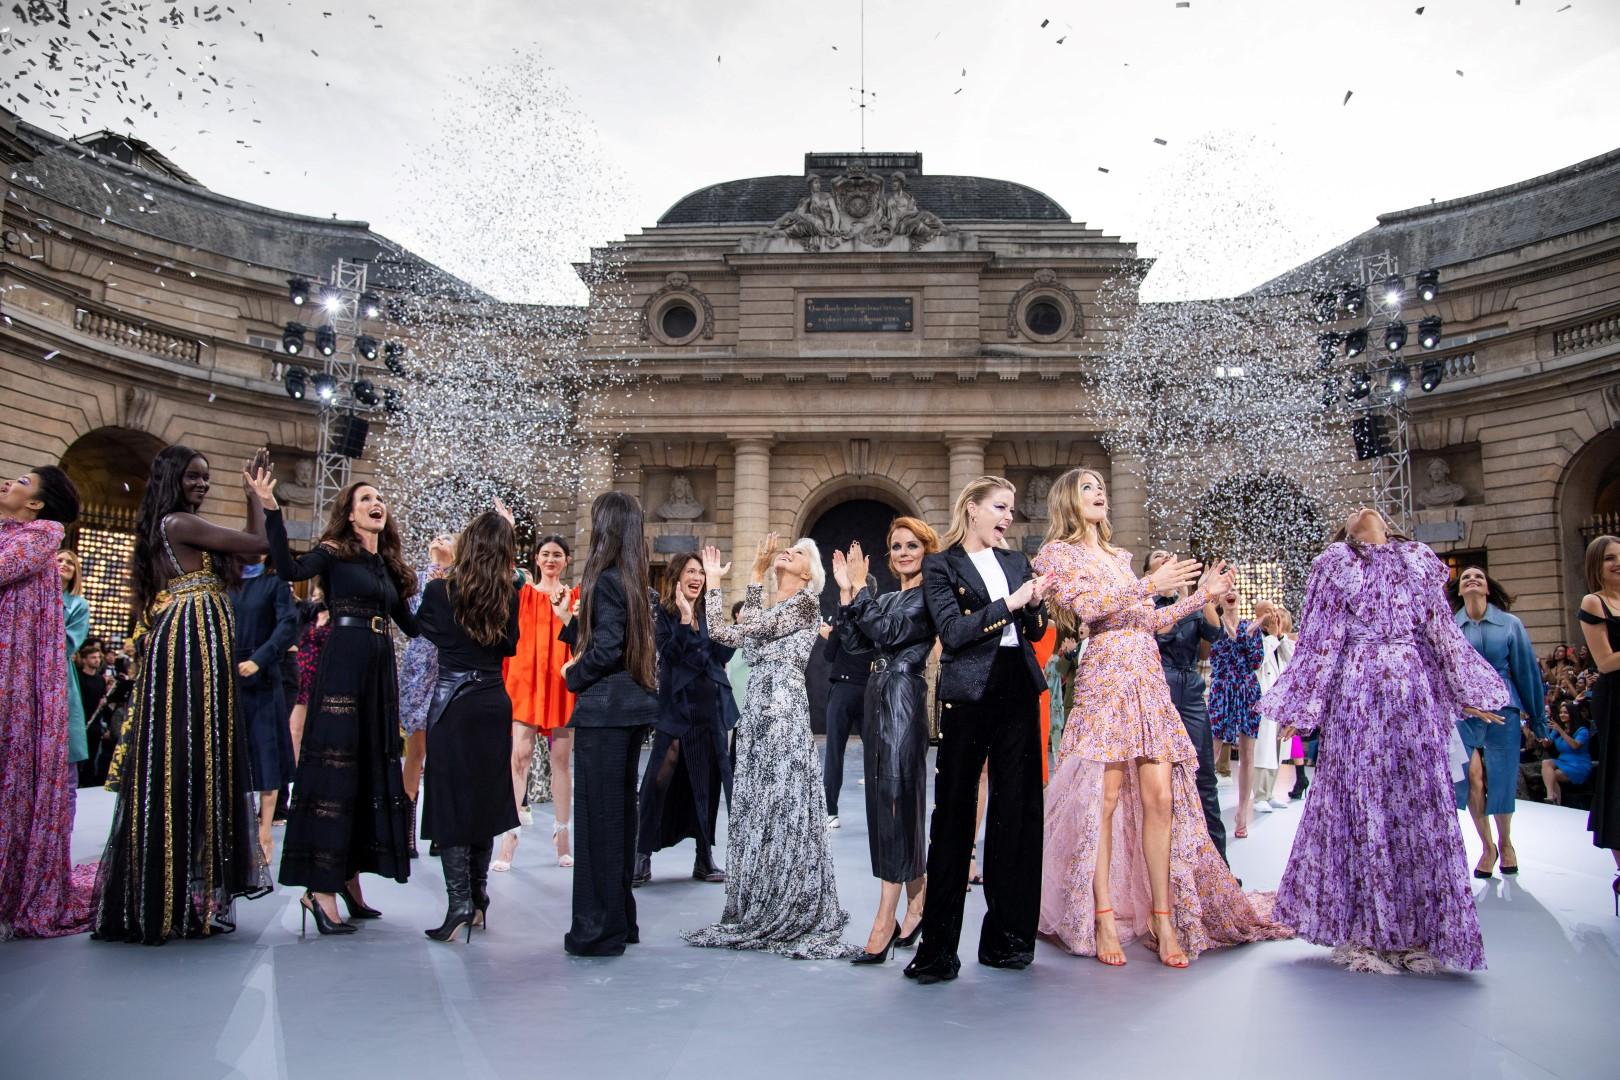 Sfilata L'Oreal Paris 2019